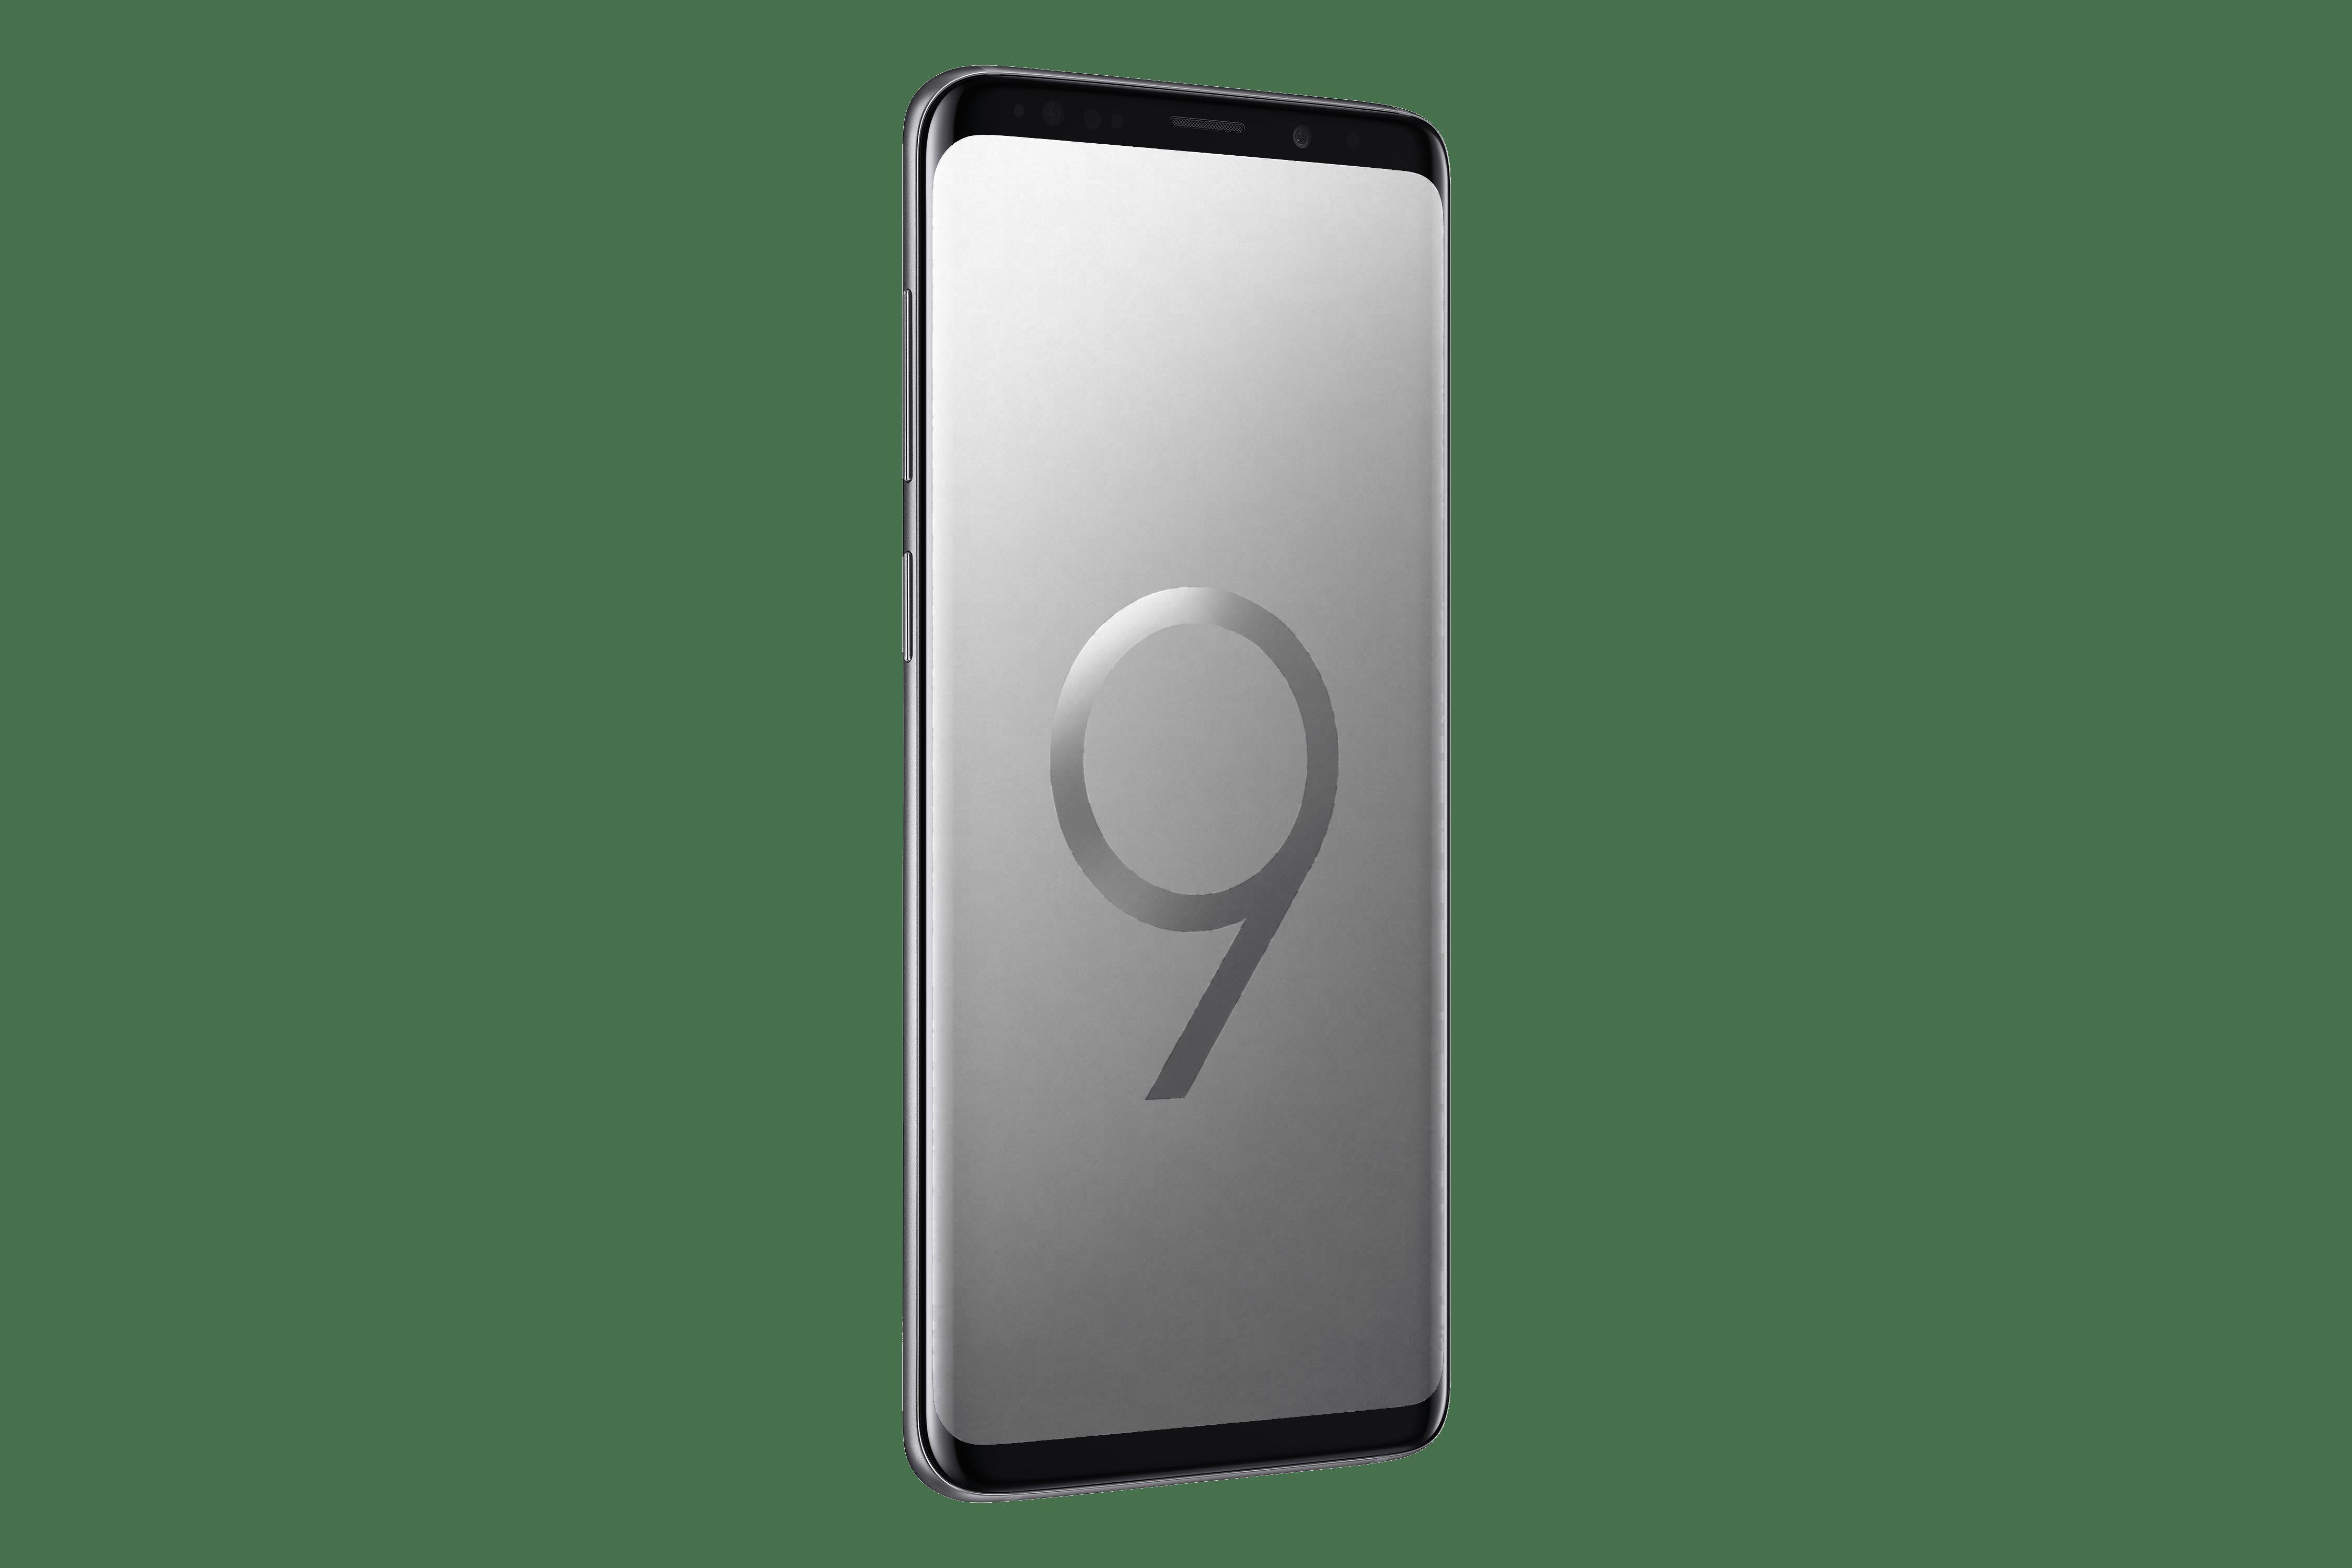 Samsung Galaxy S9+, цвет титан